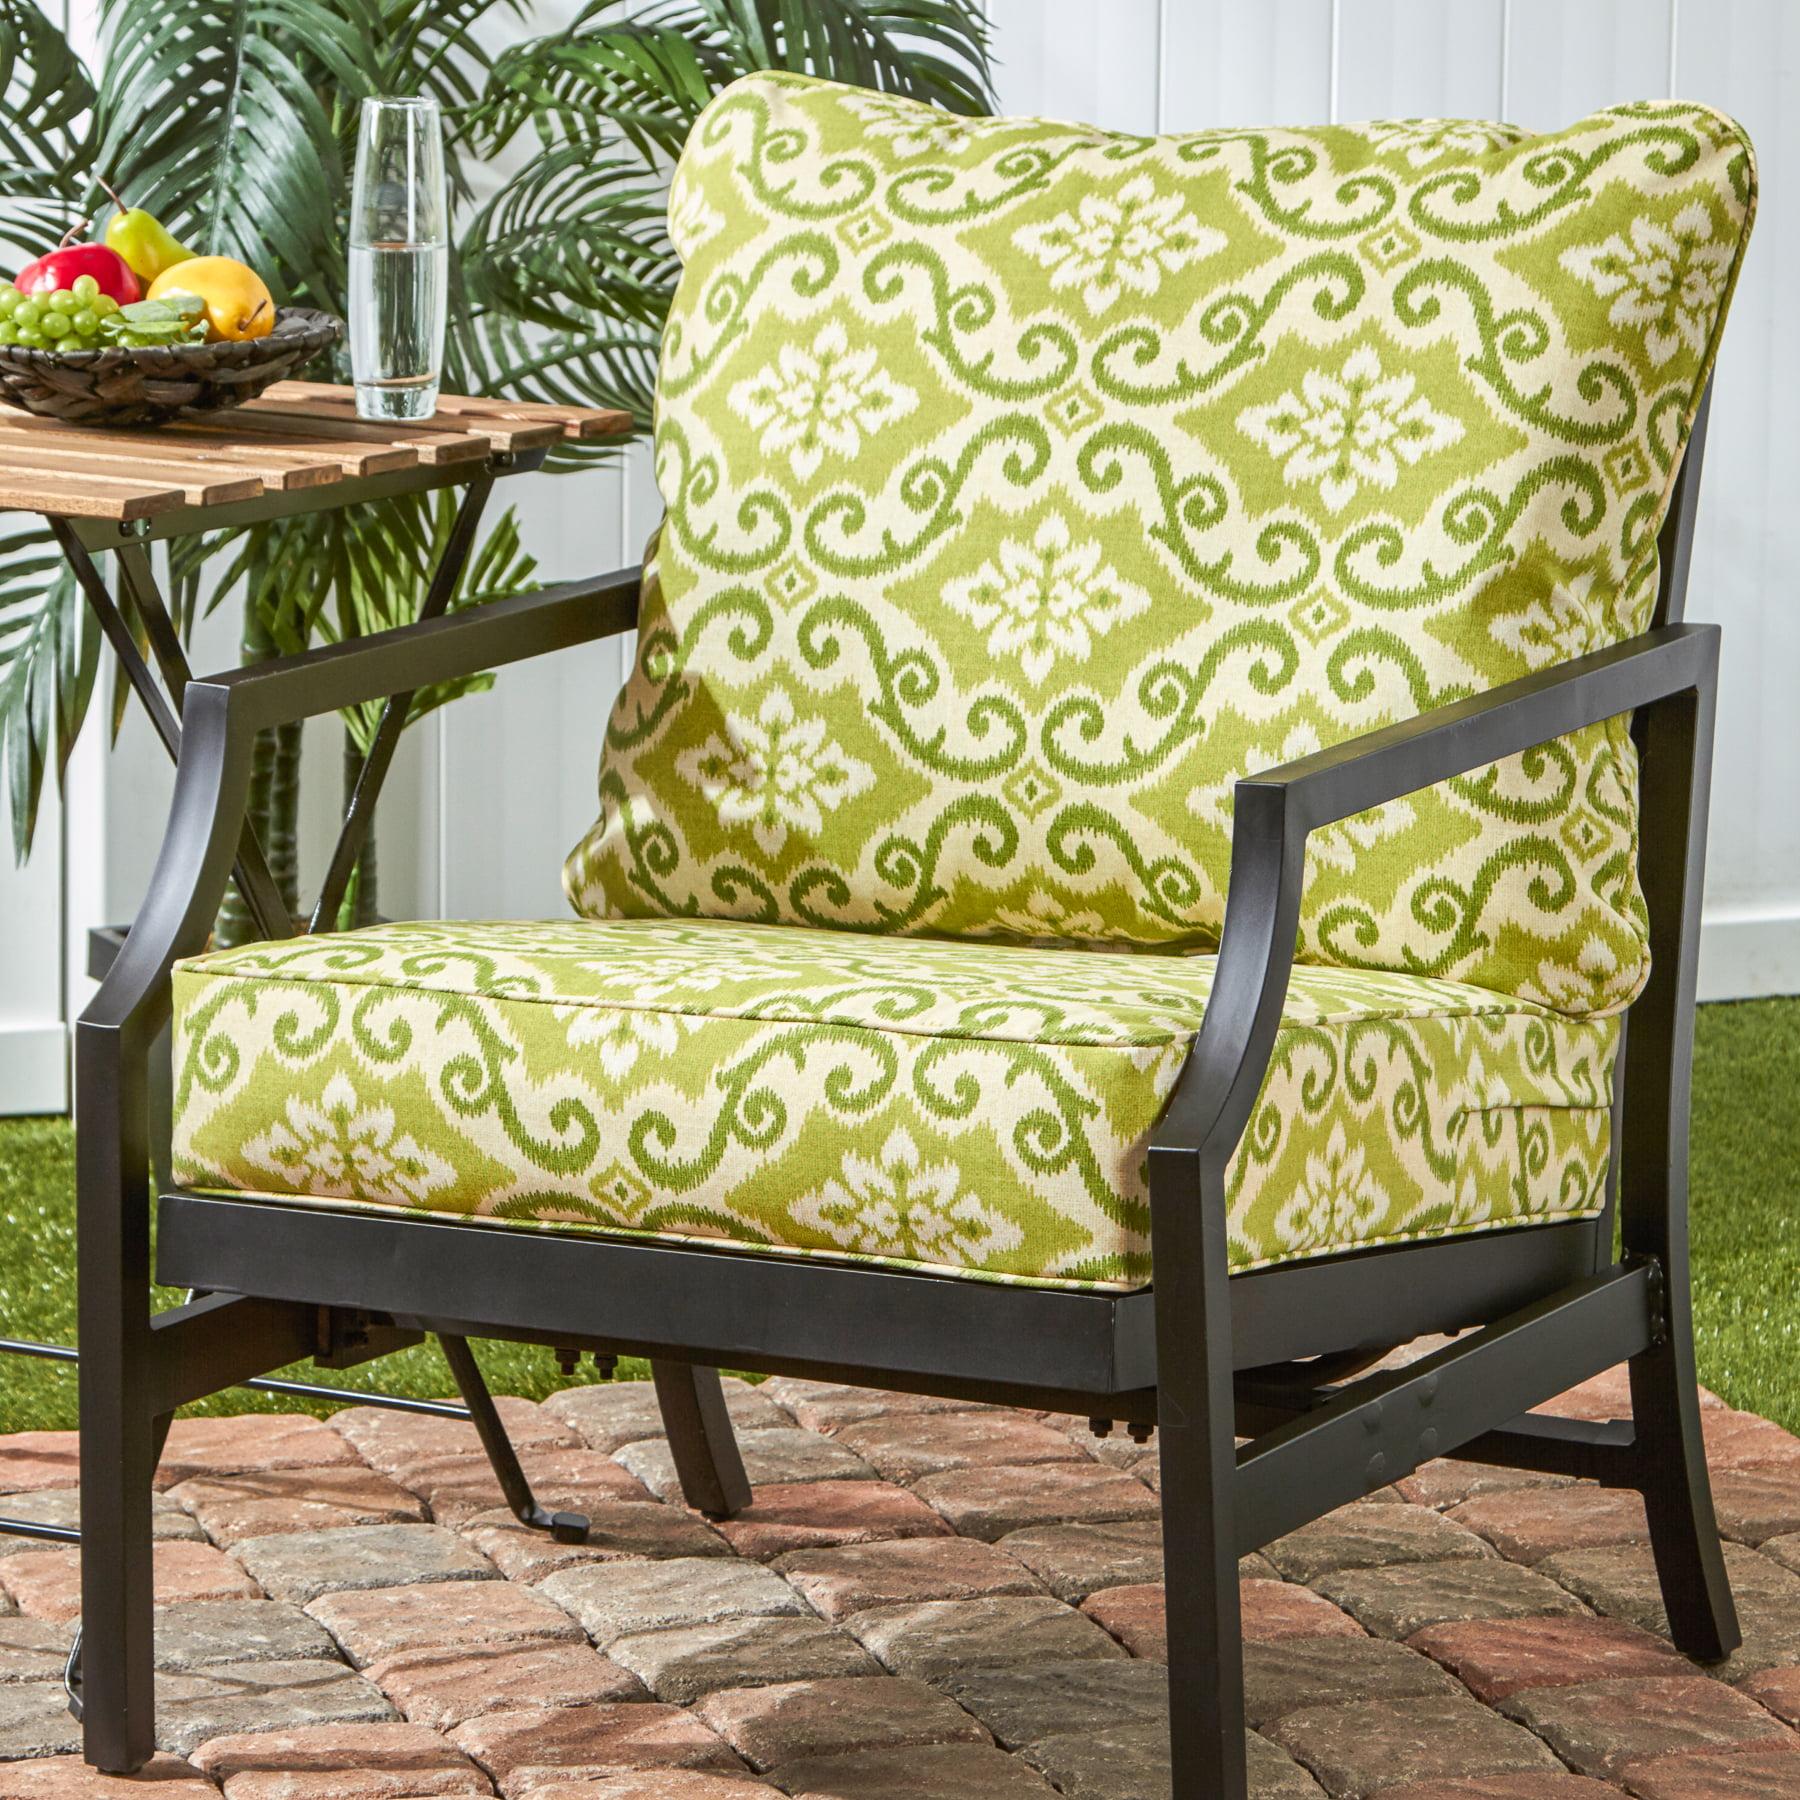 Greendale Home Fashions Shoreham Outdoor Deep Seat Cushion Set by Greendale Home Fashions